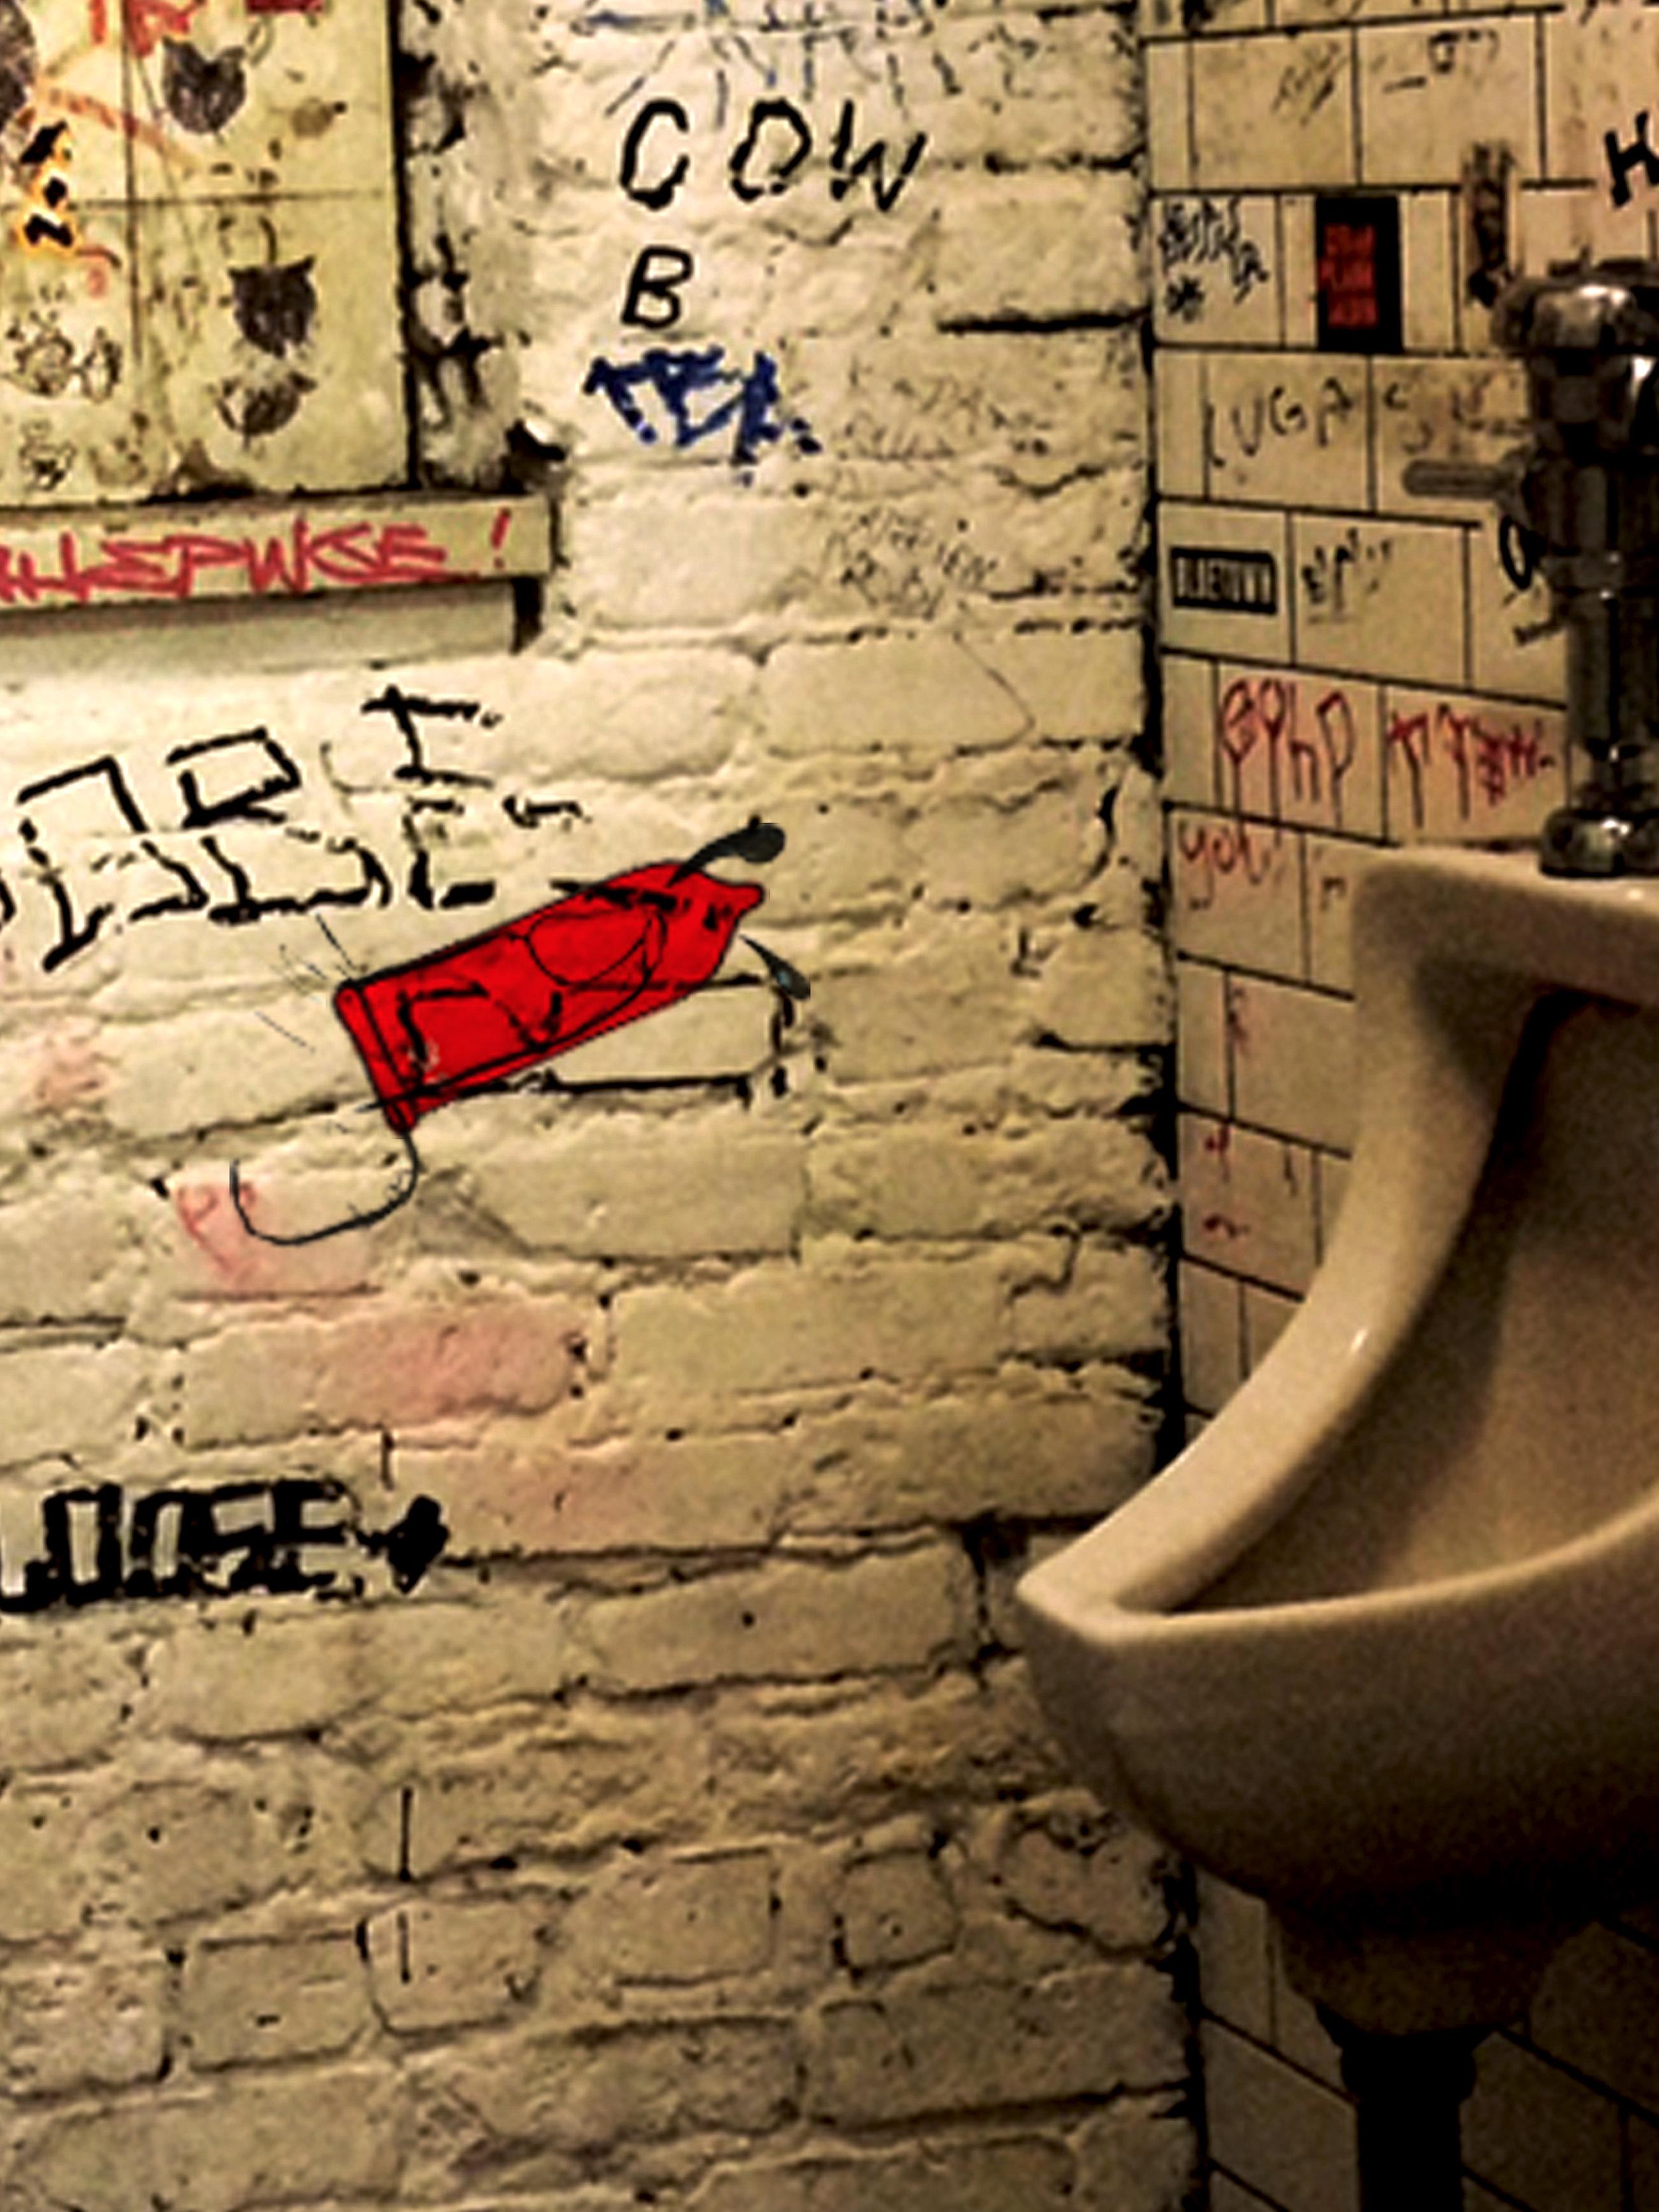 toiletdick.jpg